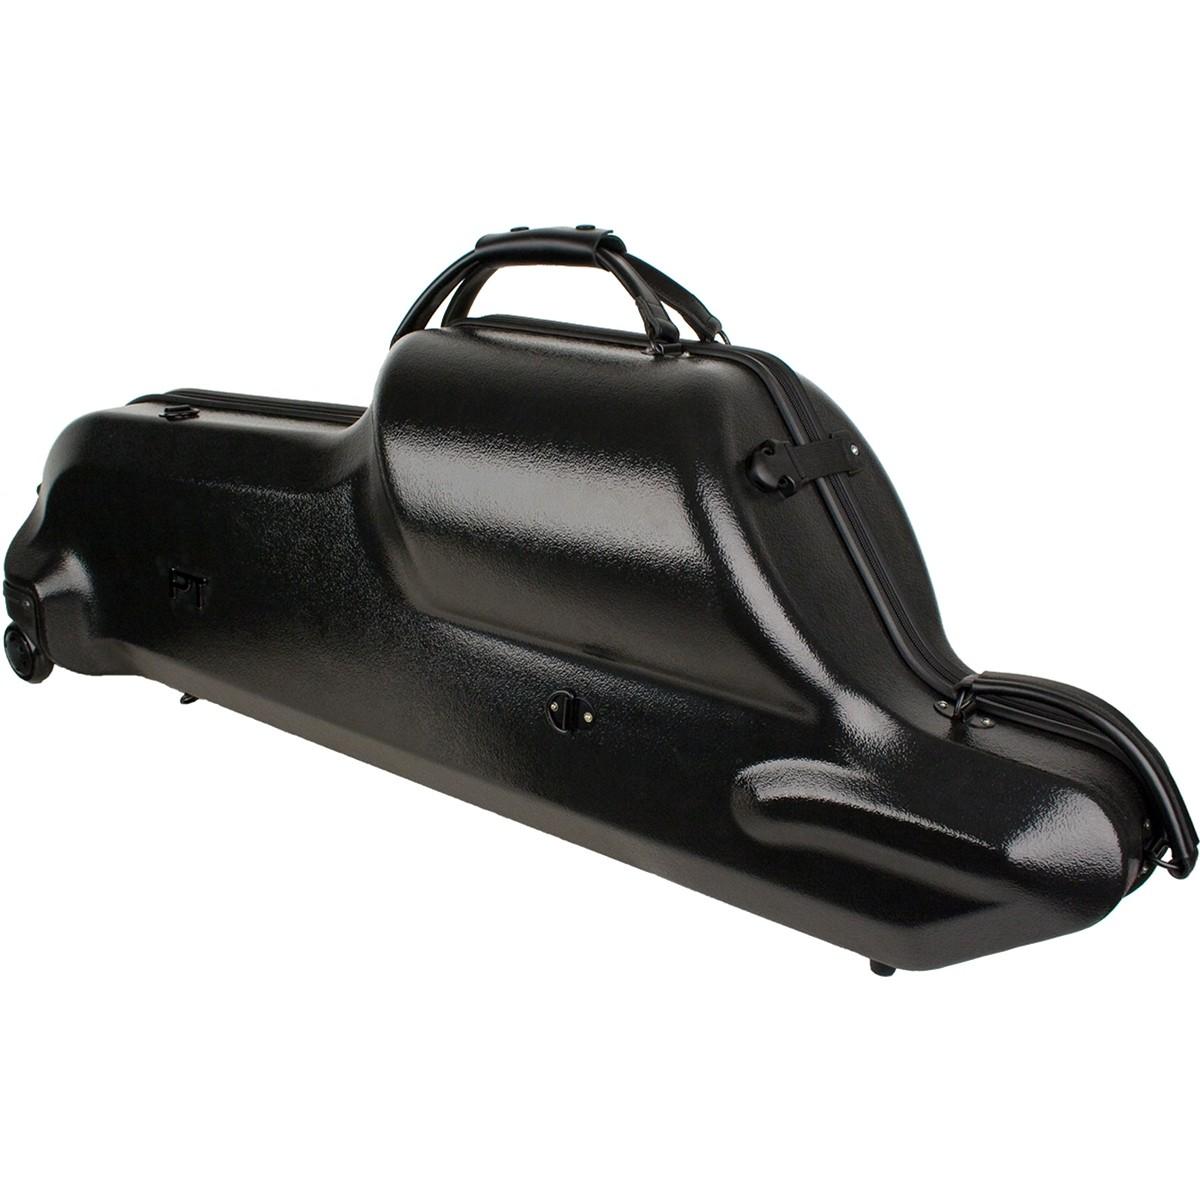 Protec Baritone Low A & Bb Saxophone Contoured ZIP Case (BLT311CT)